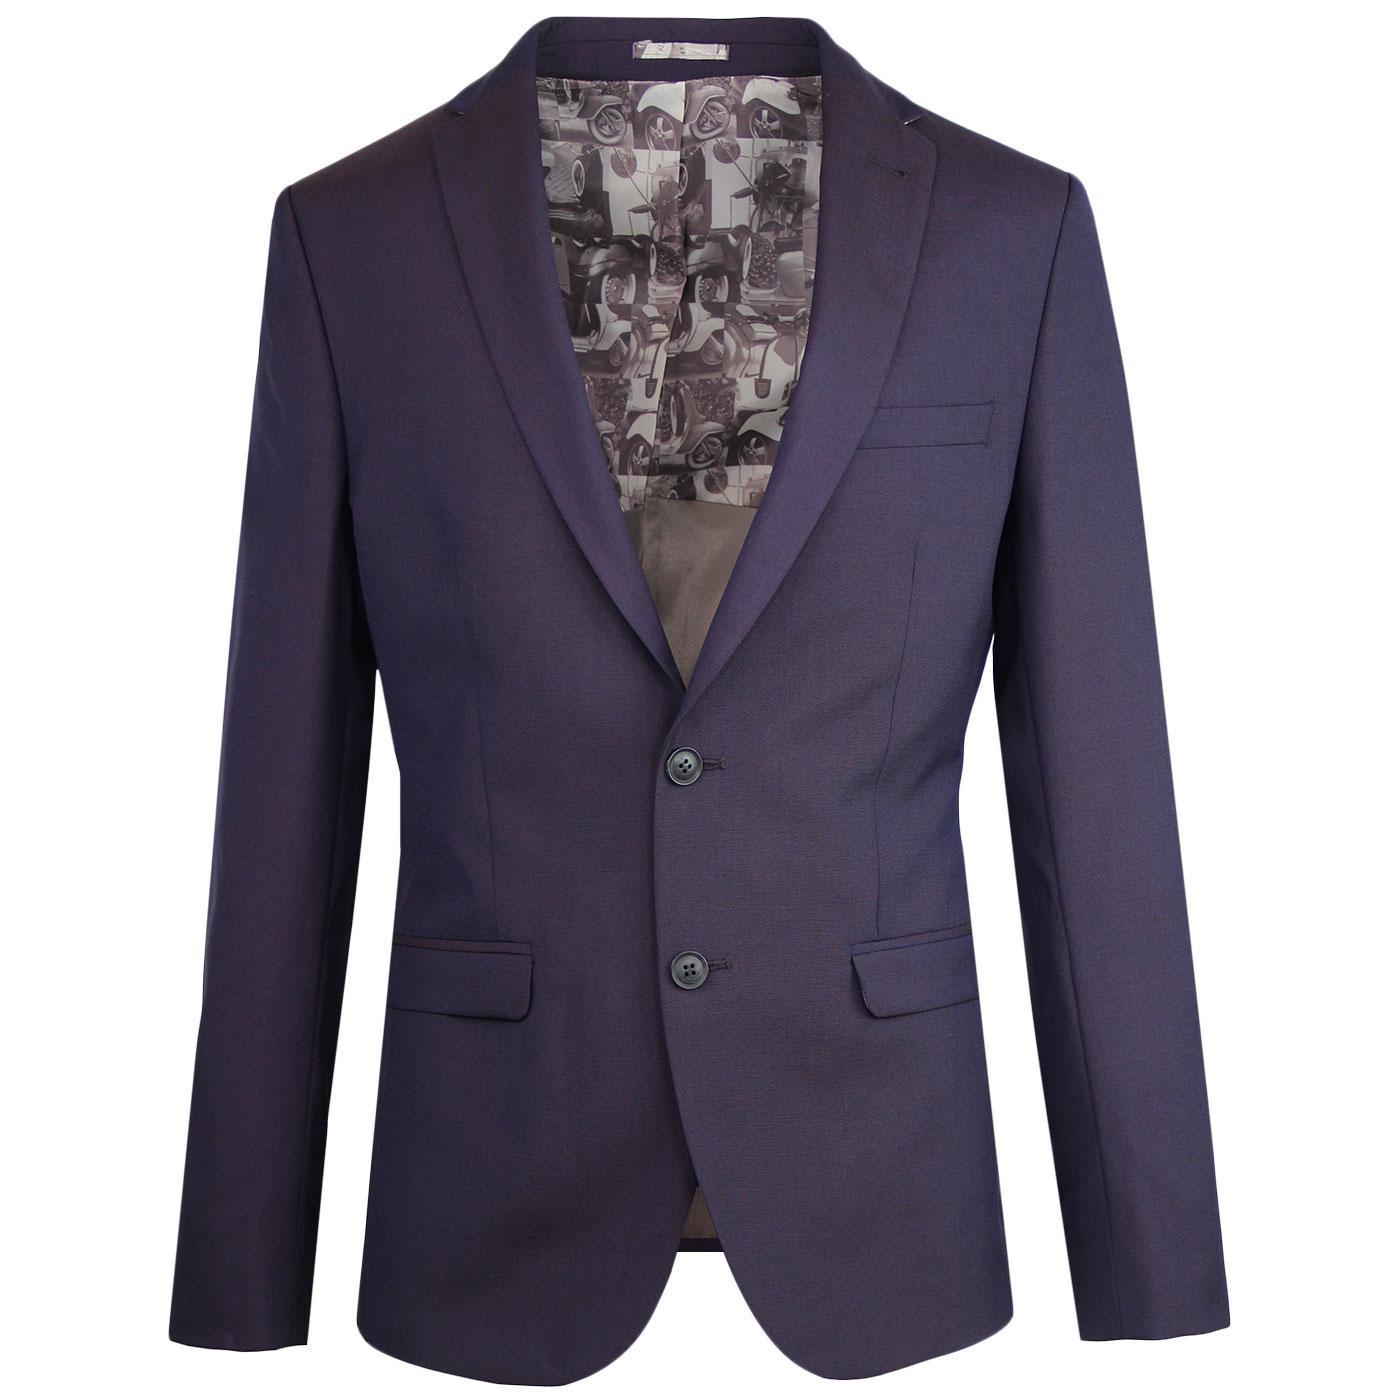 BEN SHERMAN Tailoring Tonic Scooter Suit Jacket A